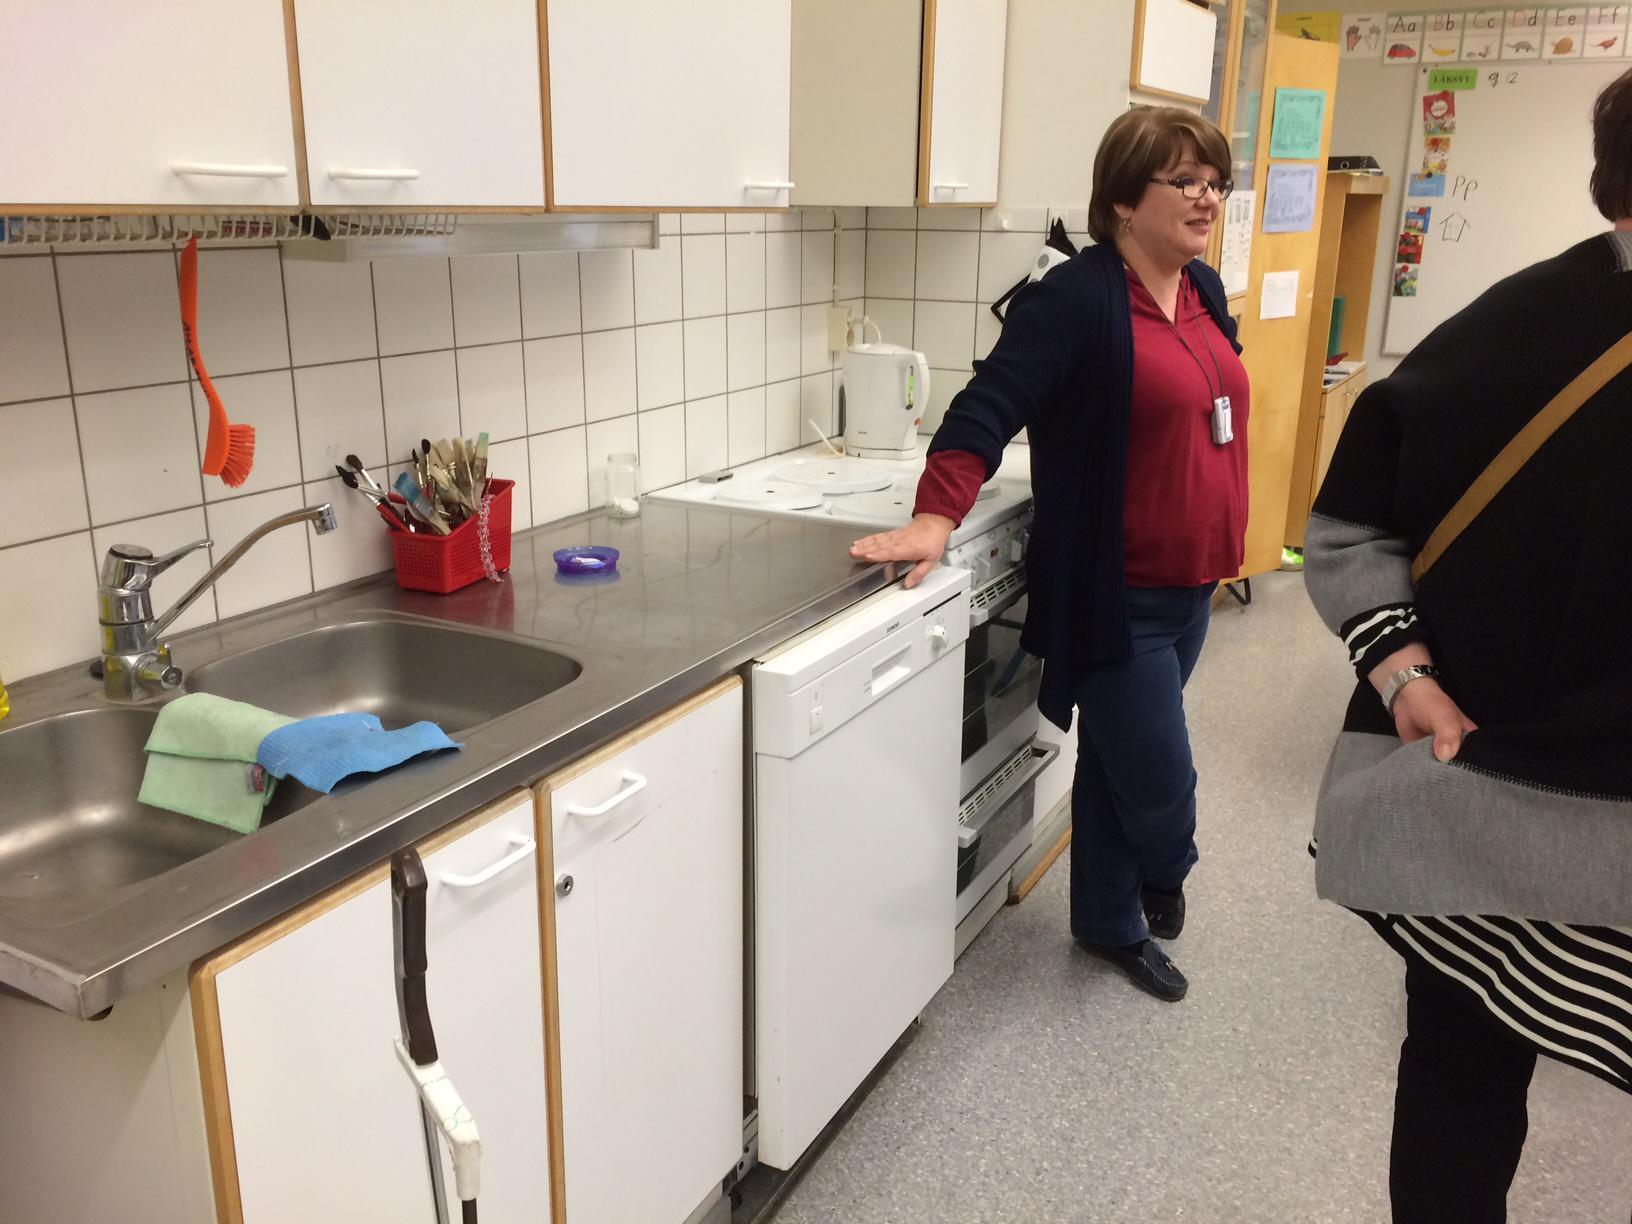 Dunya'nin En iyi Egitim Sistemi Neden Finlandiya